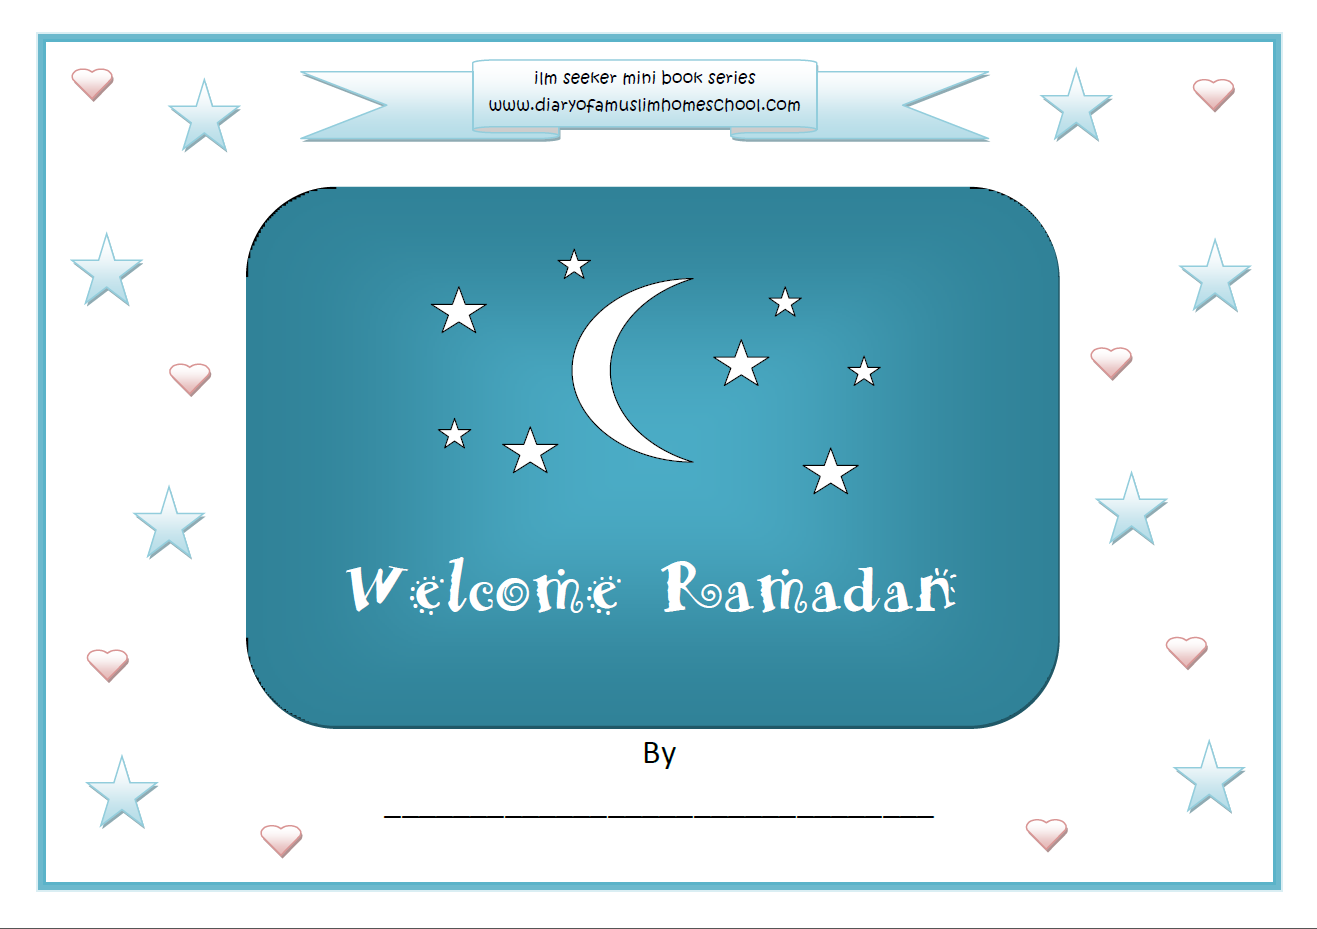 A Muslim Homeschool Welcome Ramadan Colouring Work Book